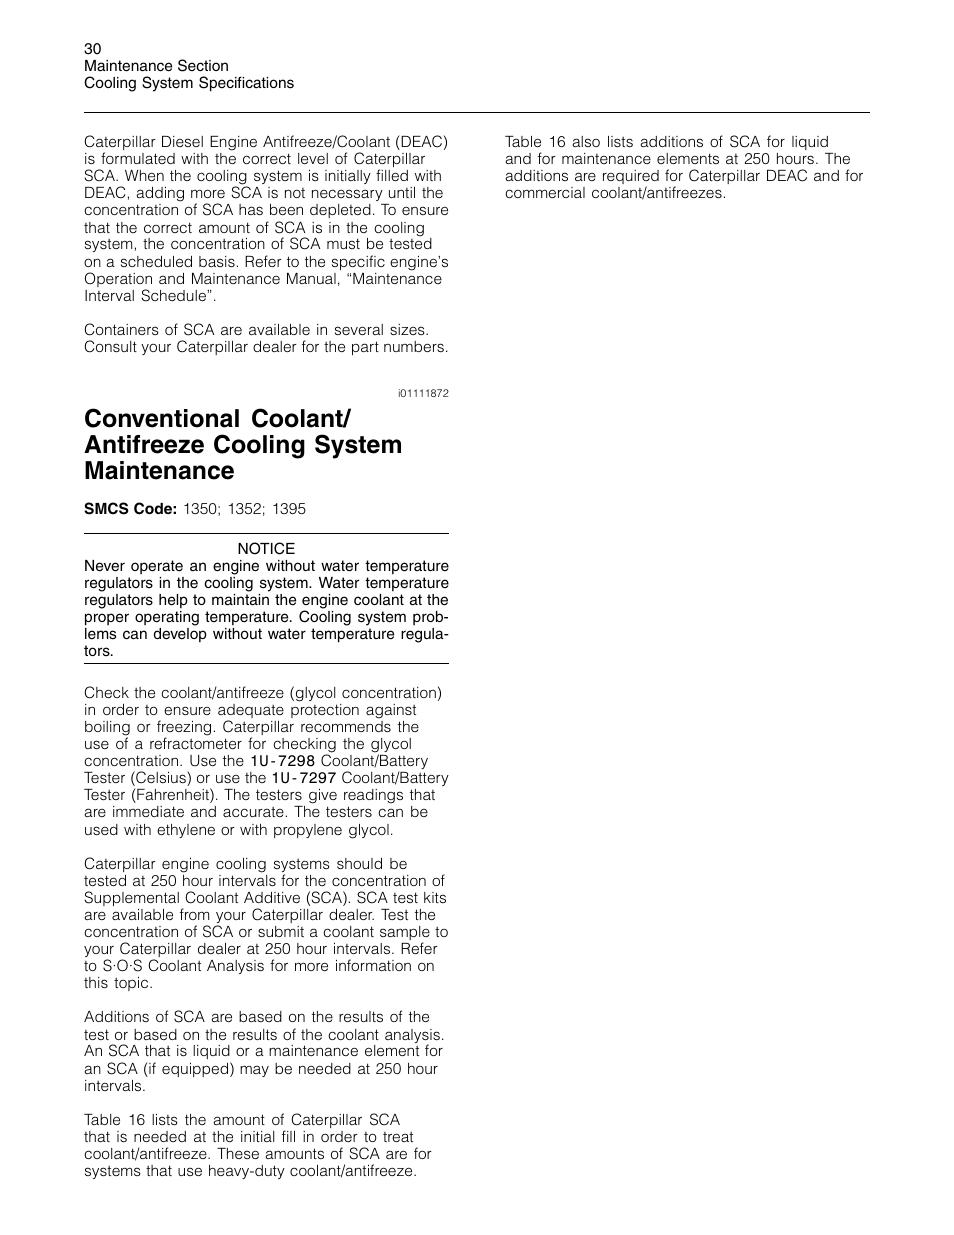 3Com Caterpillar Commercial Diesel Engine SEBU6251-06 User Manual | Page 30  / 42